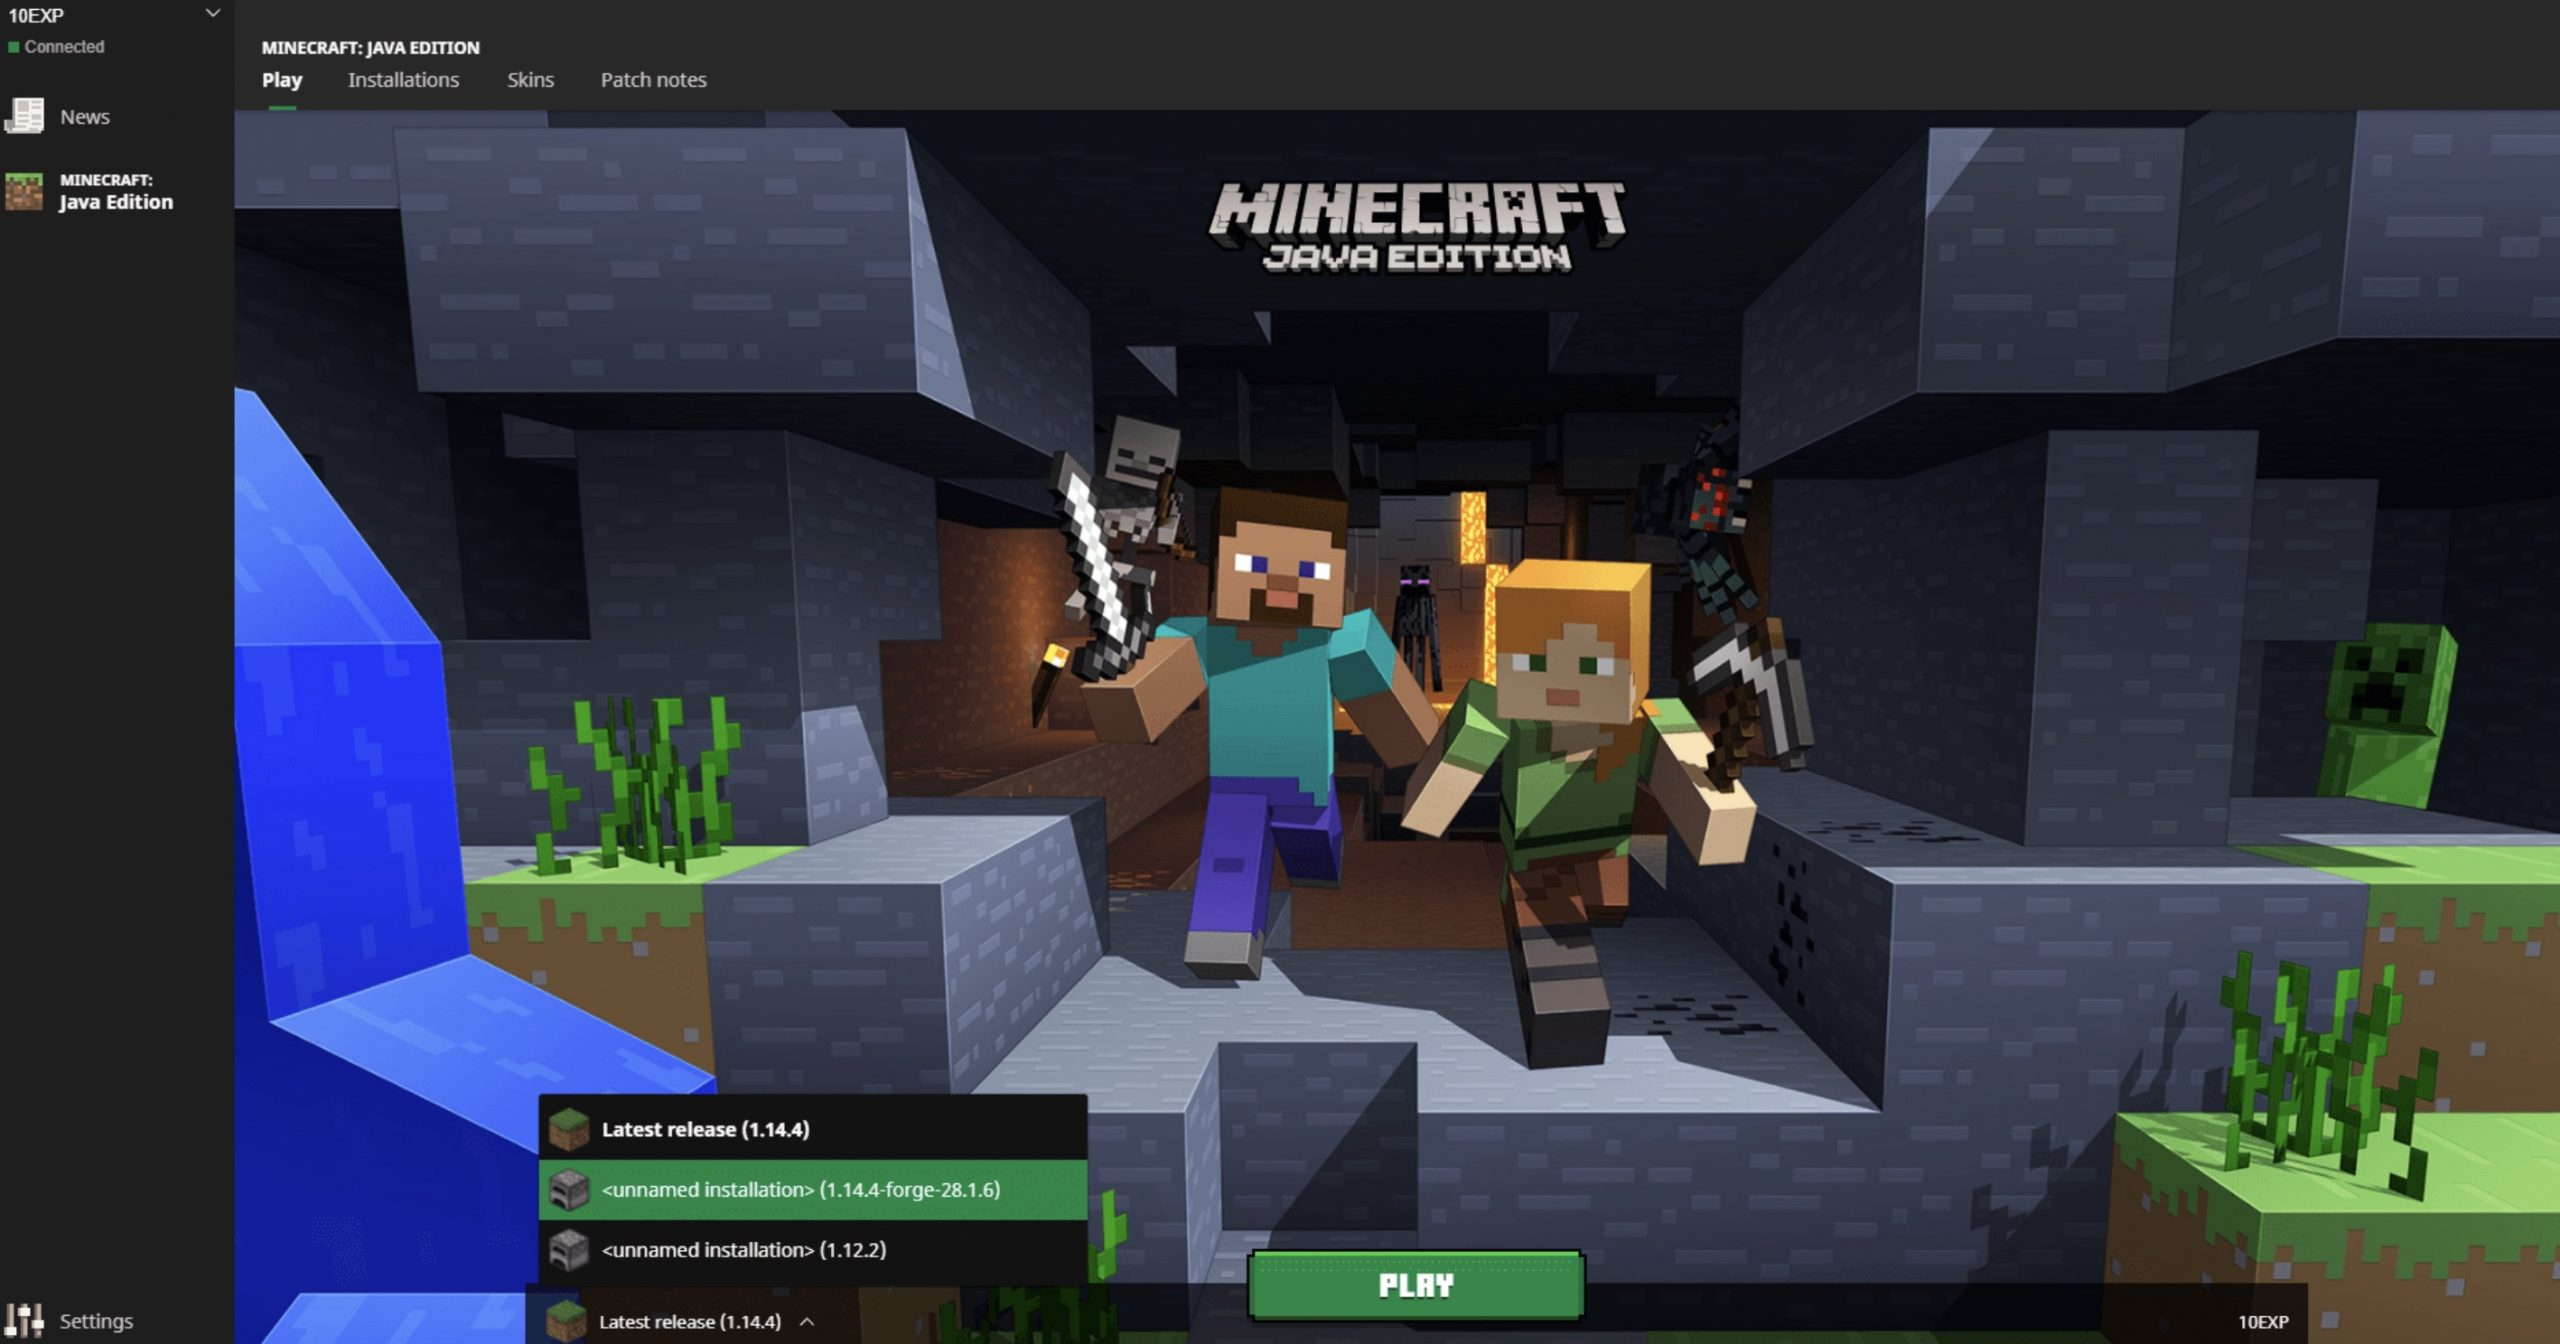 Minecraft Forge 1.17